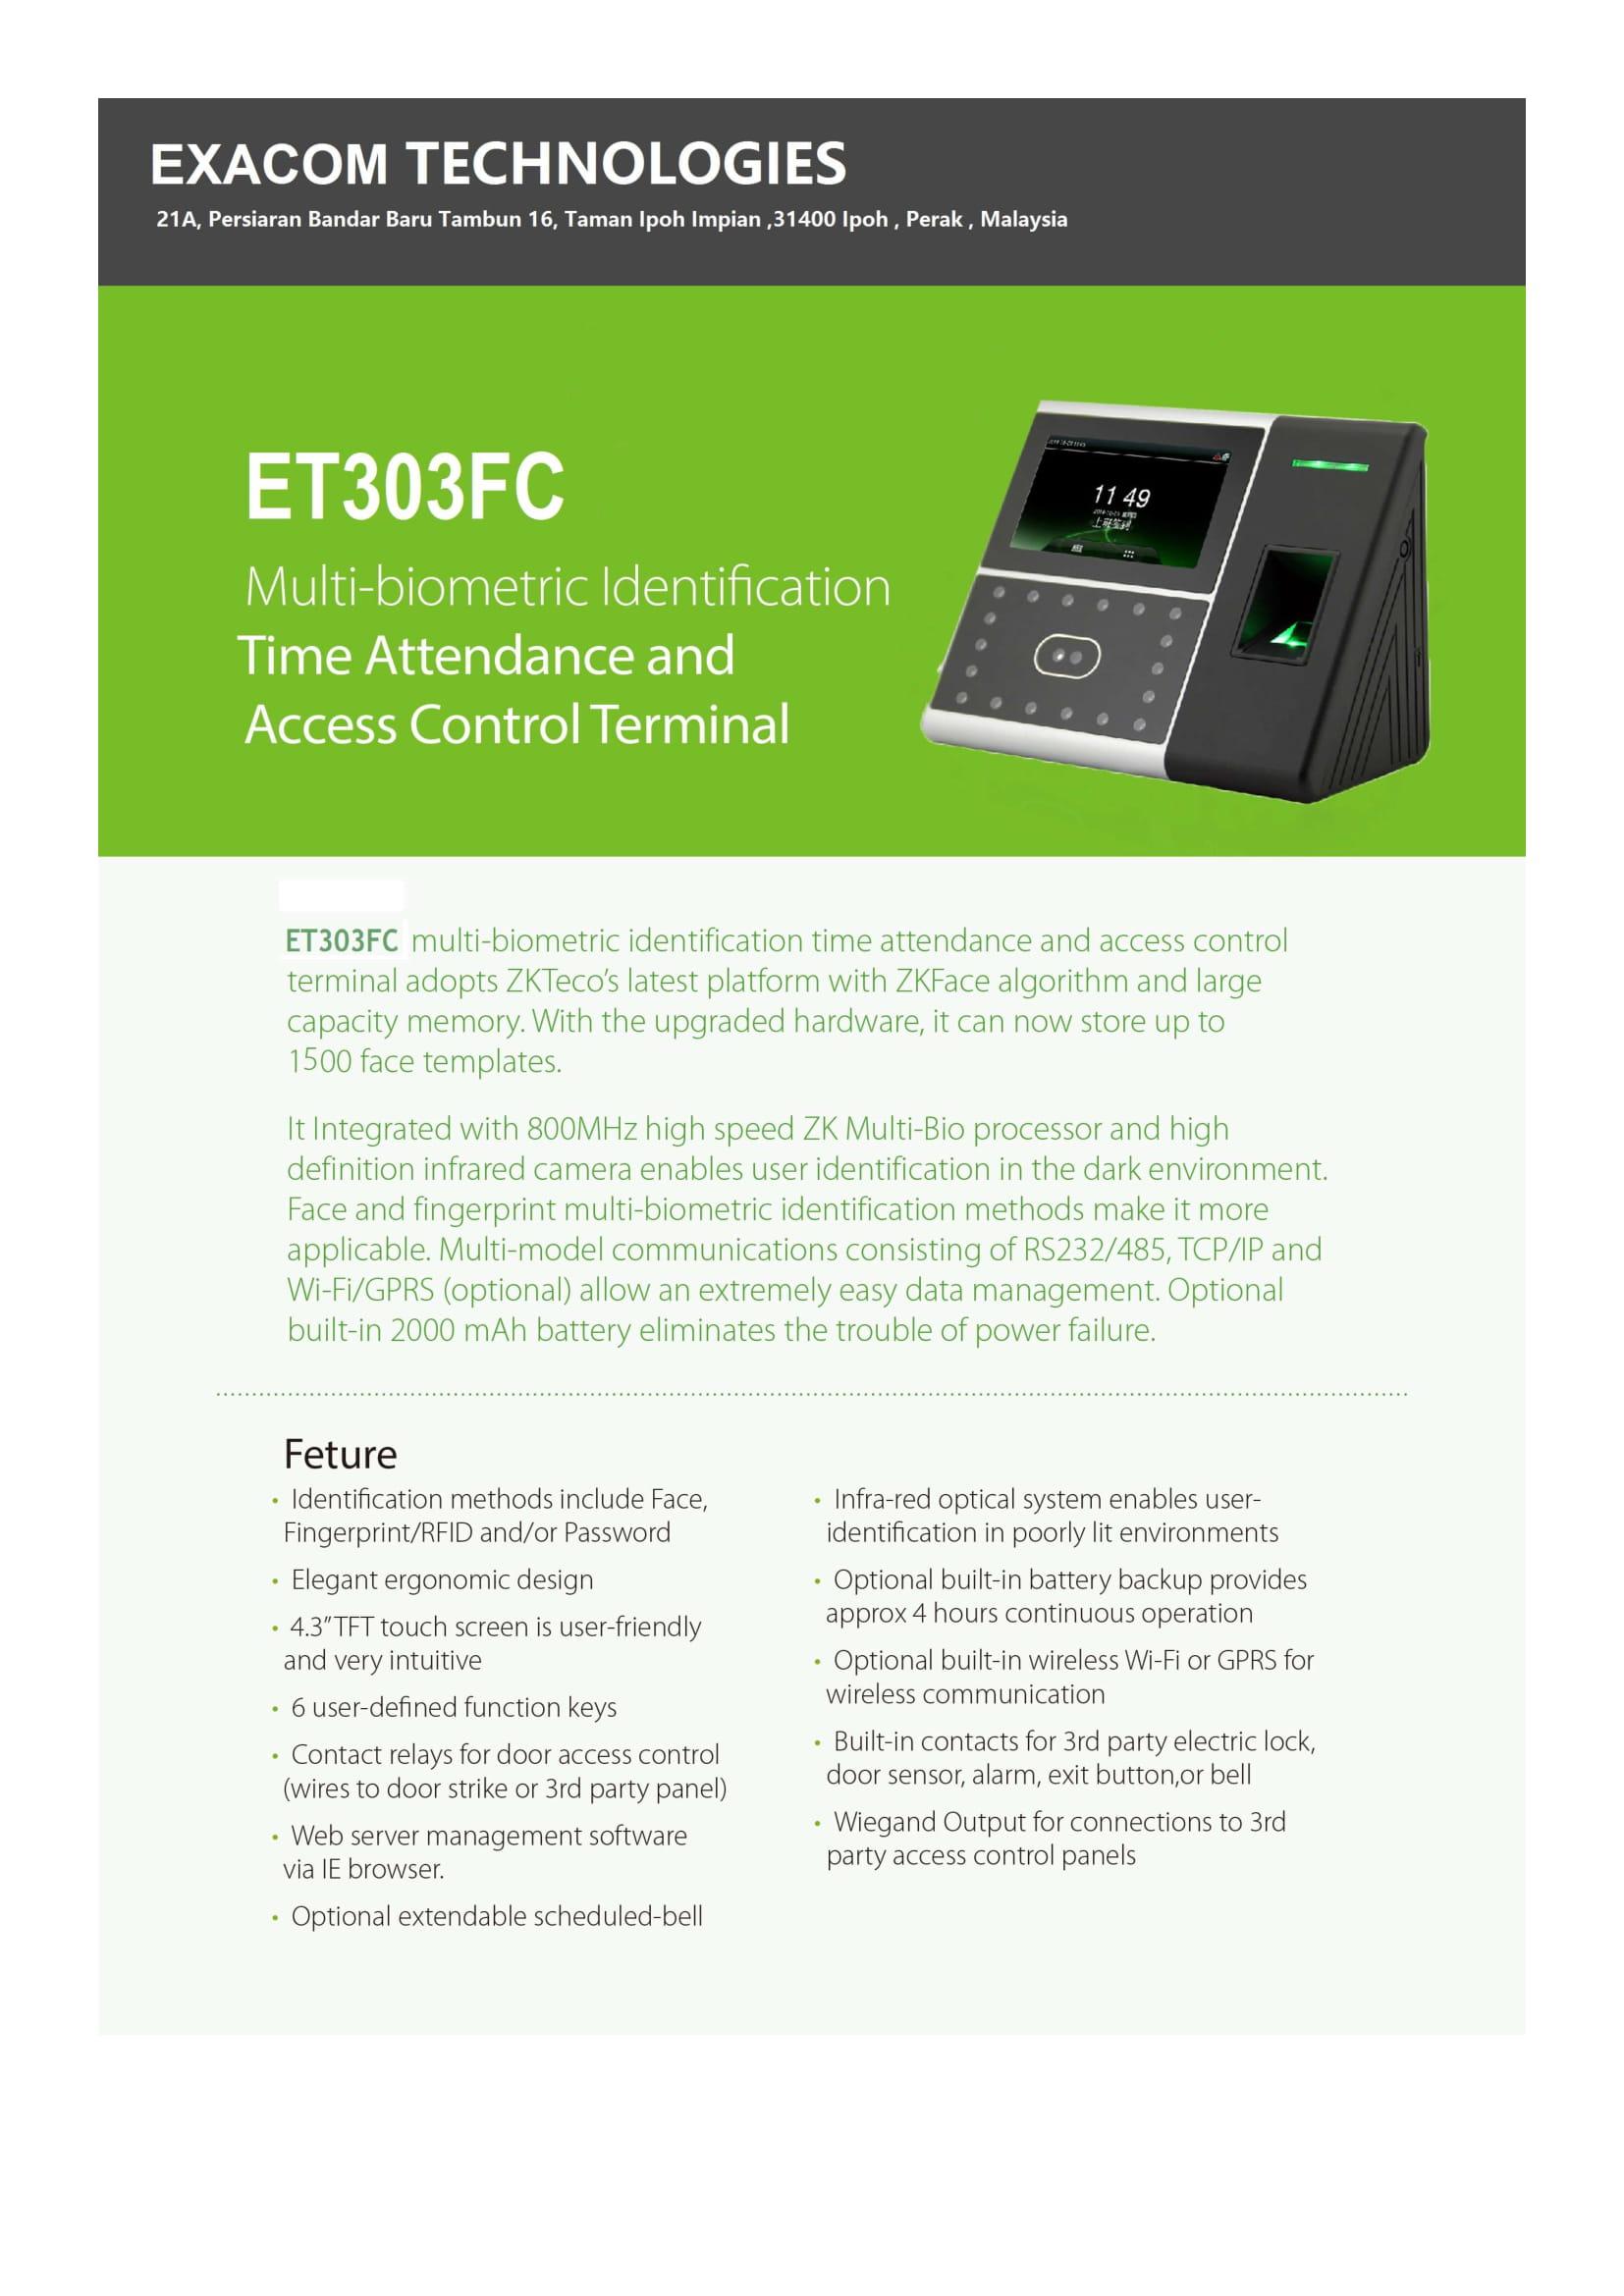 EXACOM TECHNOLOGIES | Product